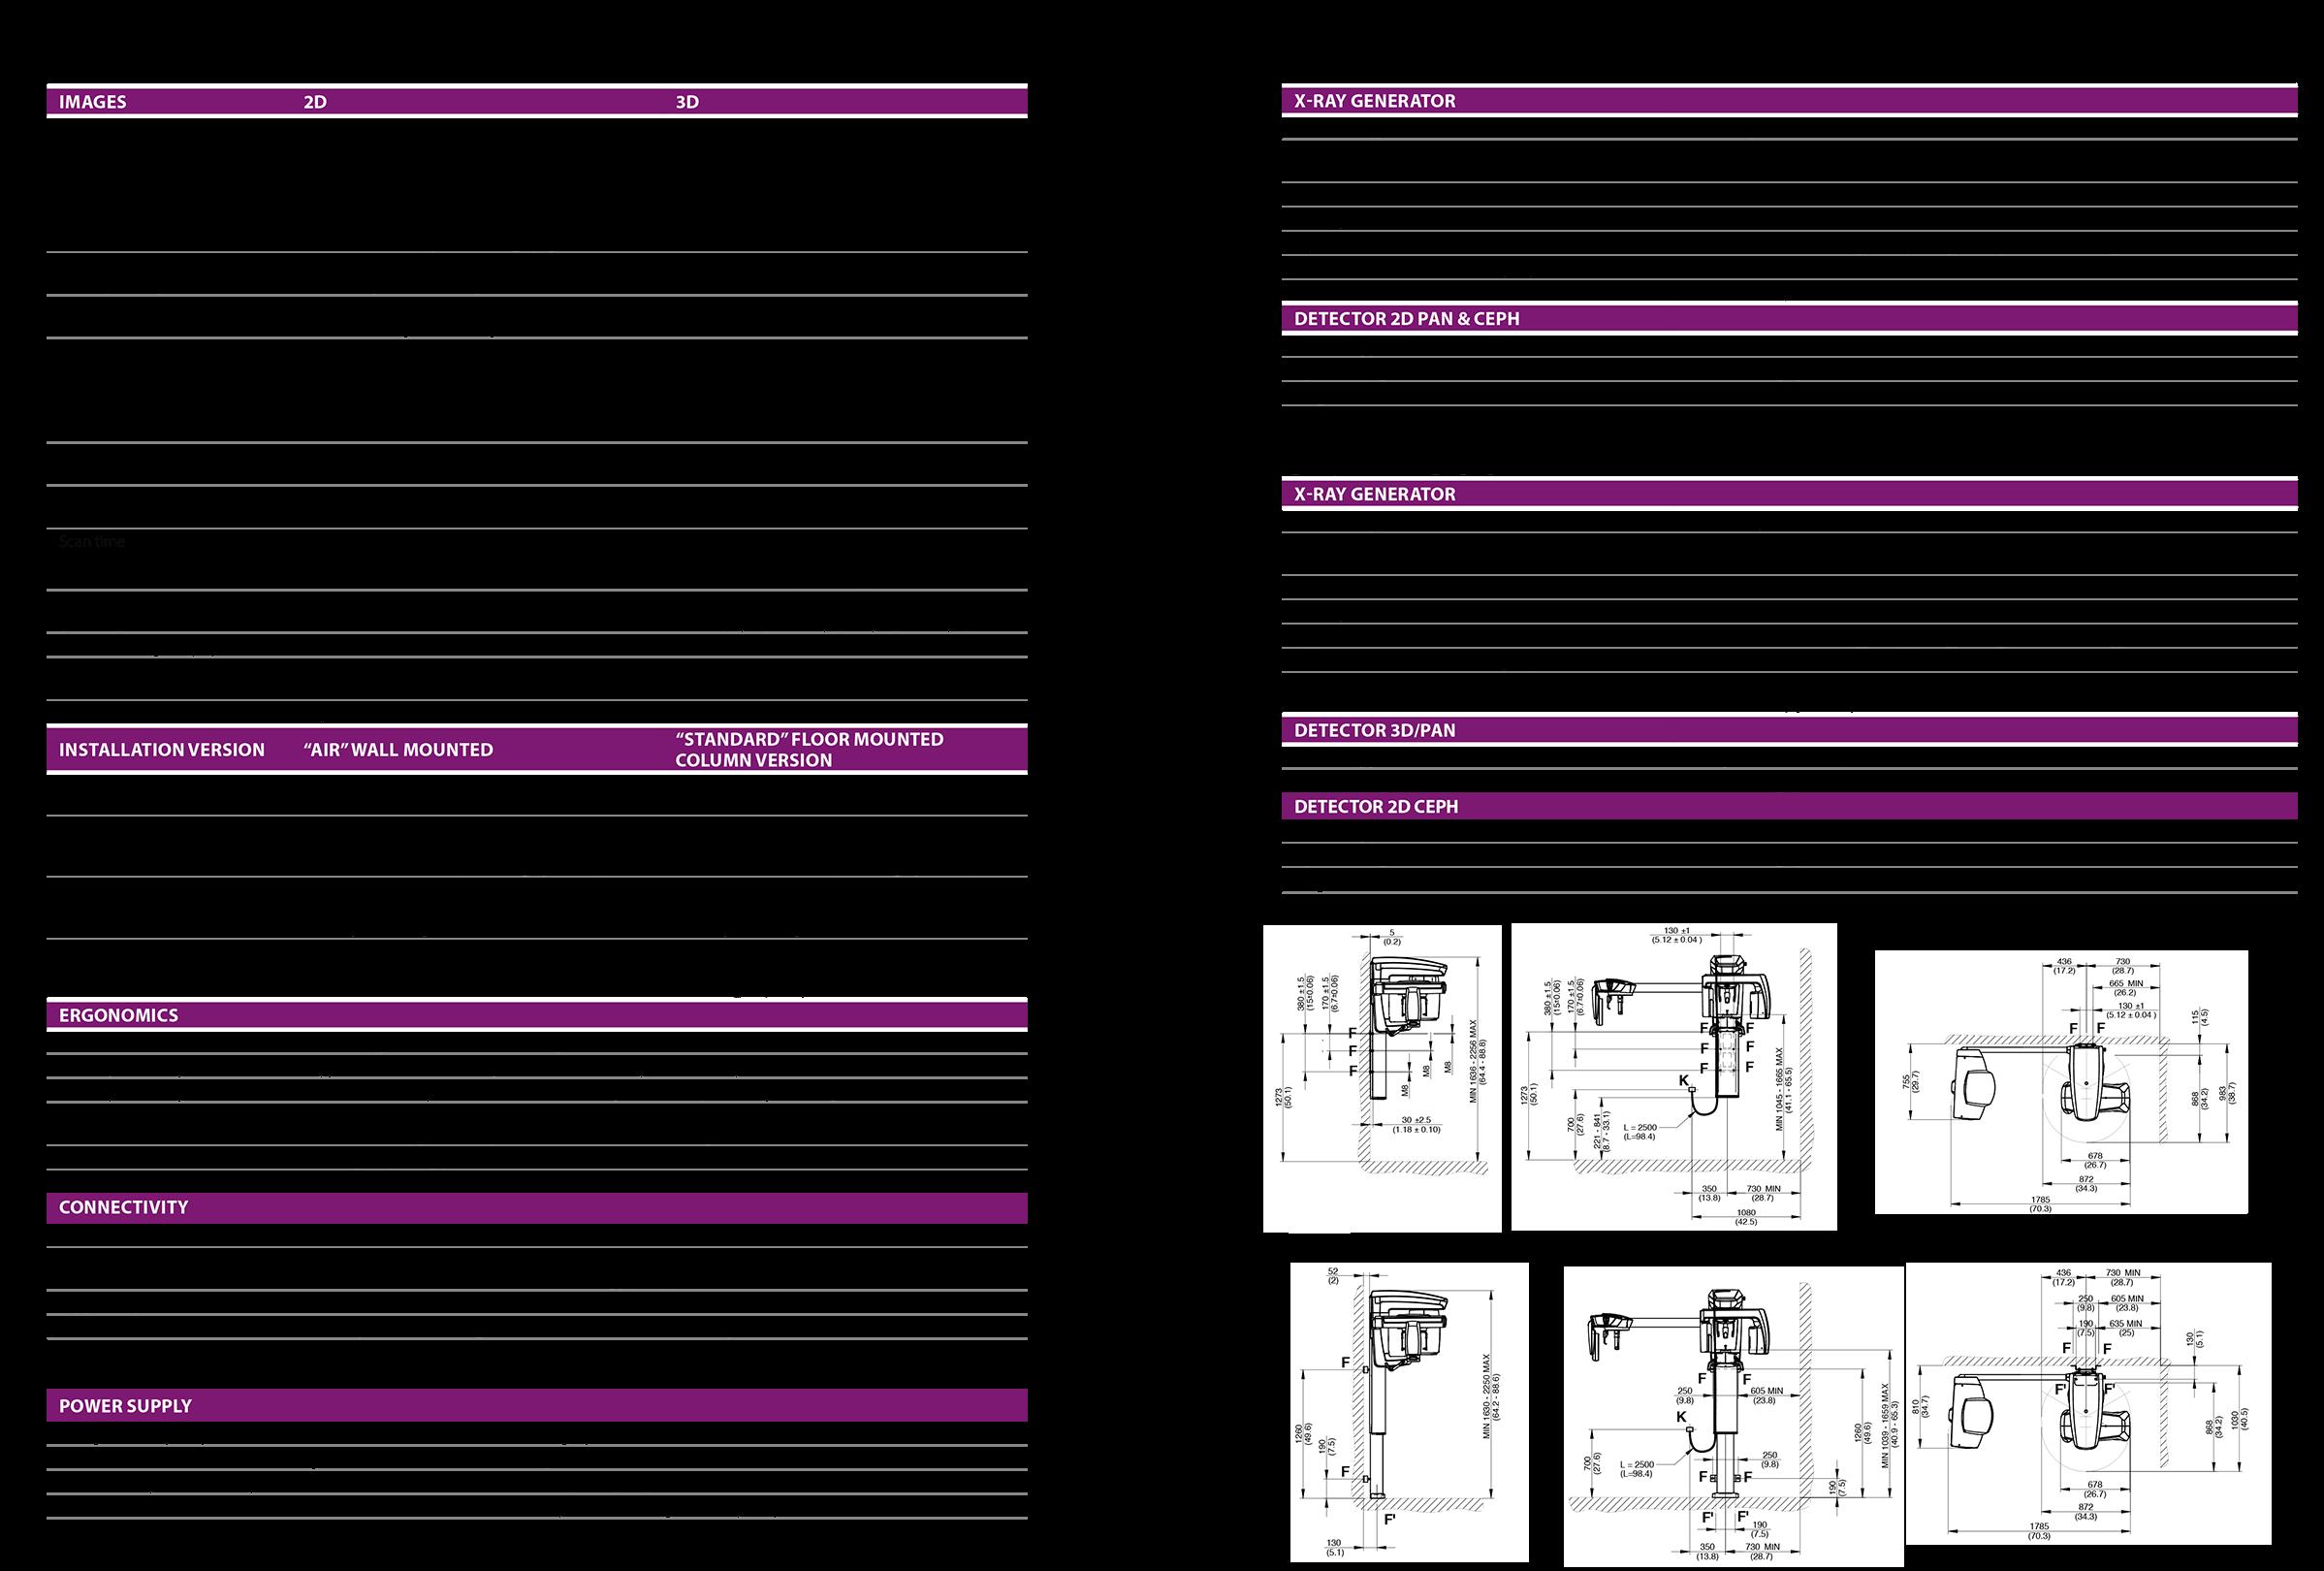 X4 System Specs